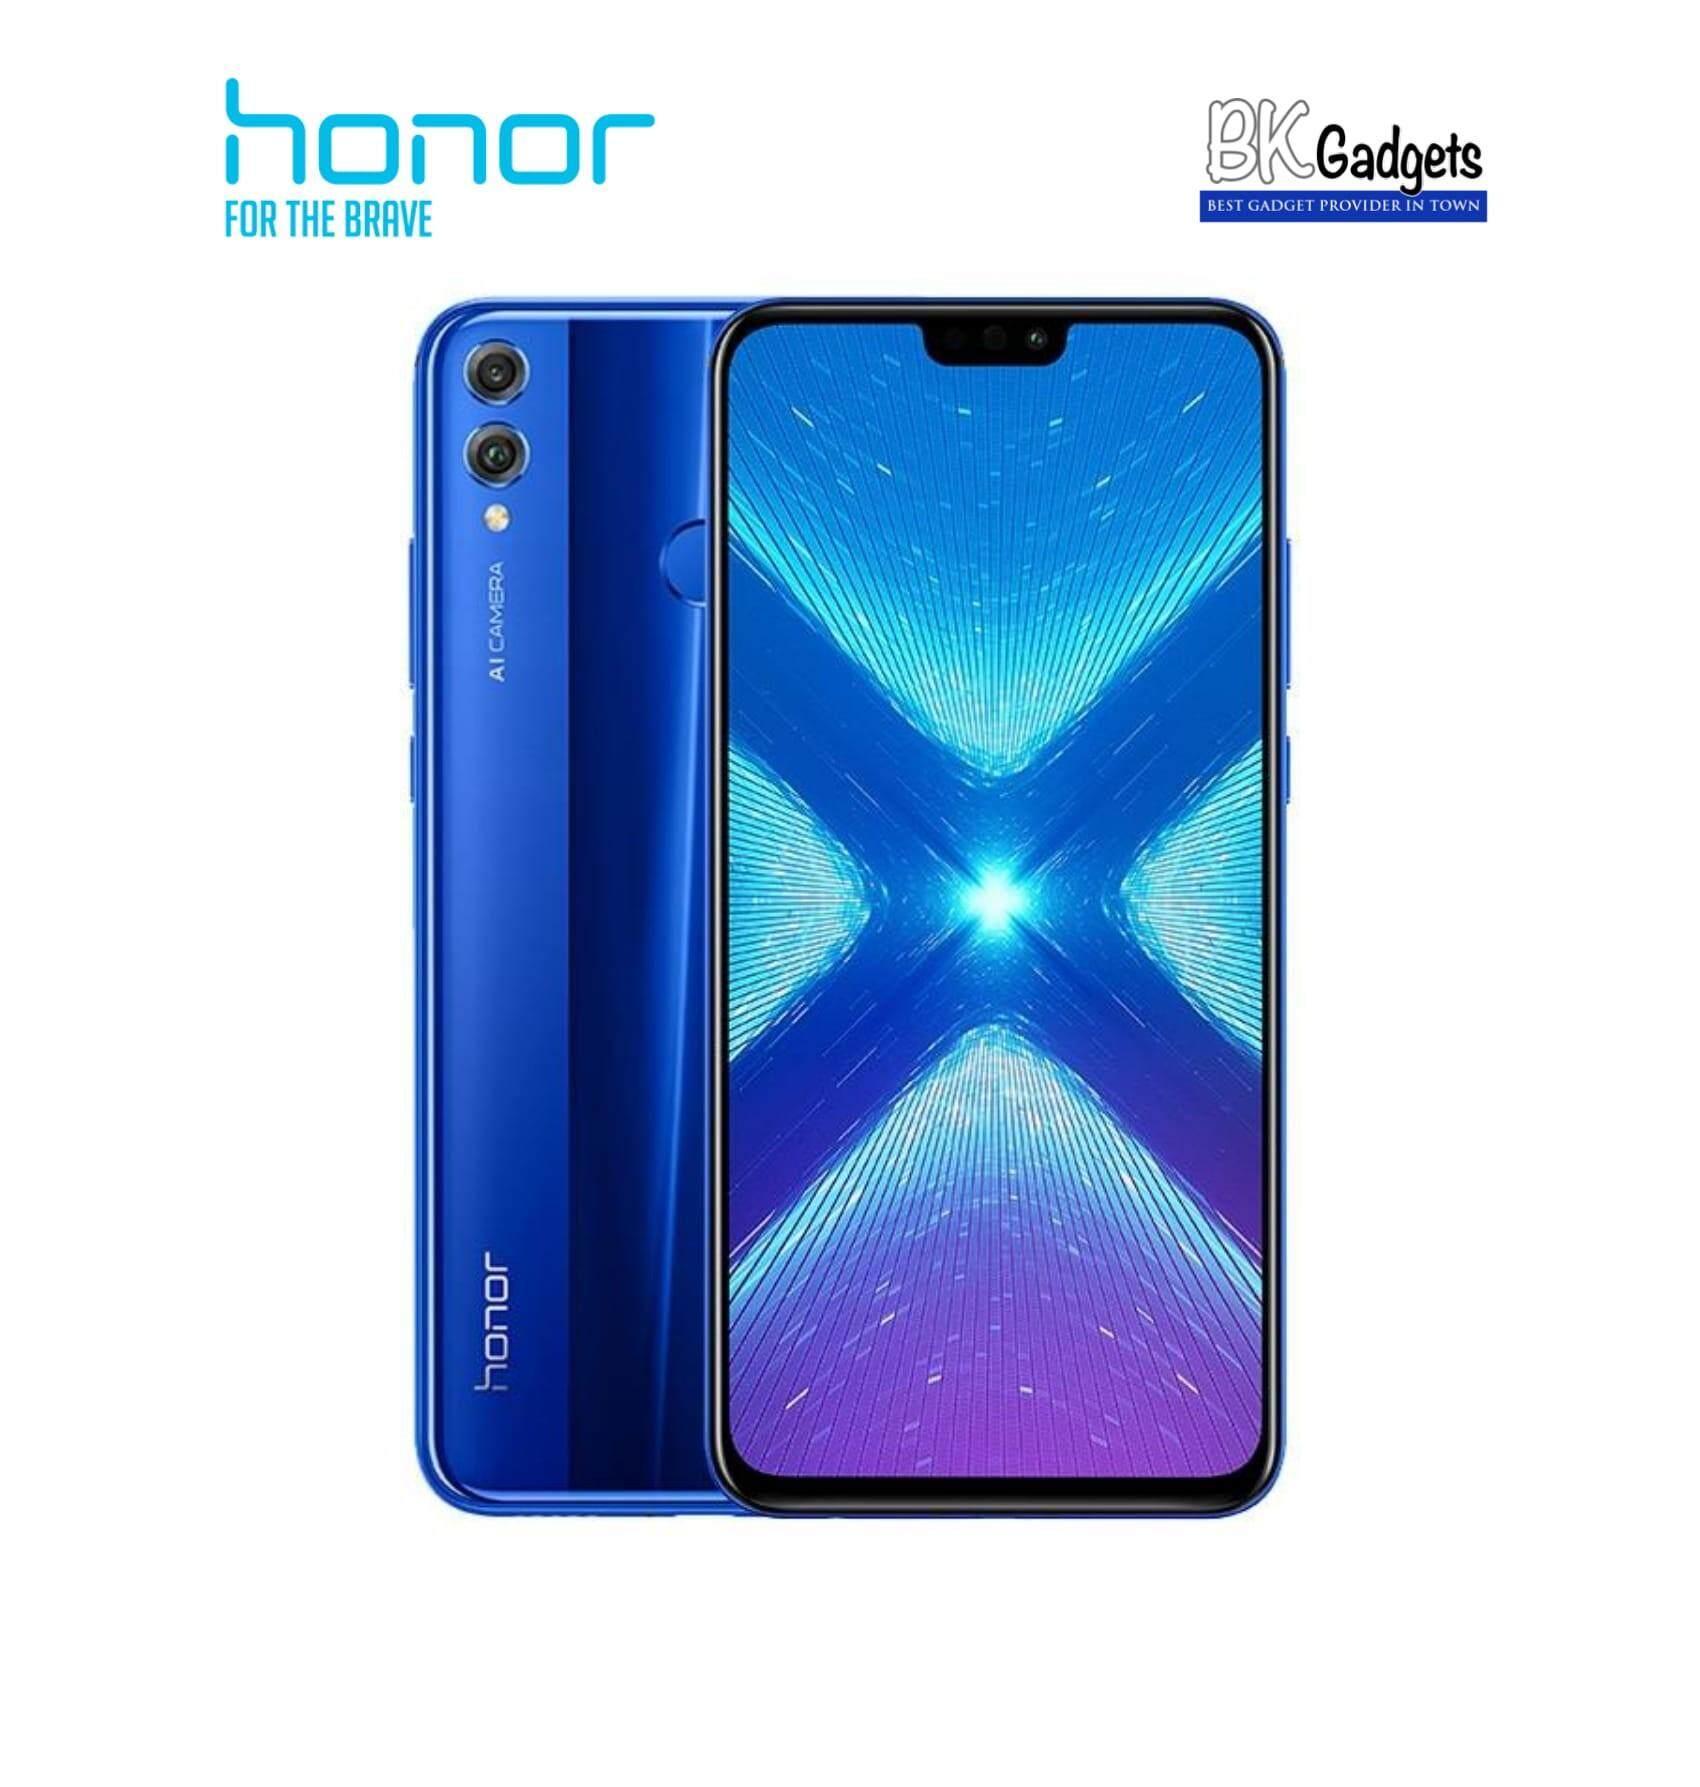 Honor 8X 4/128GB Blue- Original from Honor Malaysia 1 Year Warranty